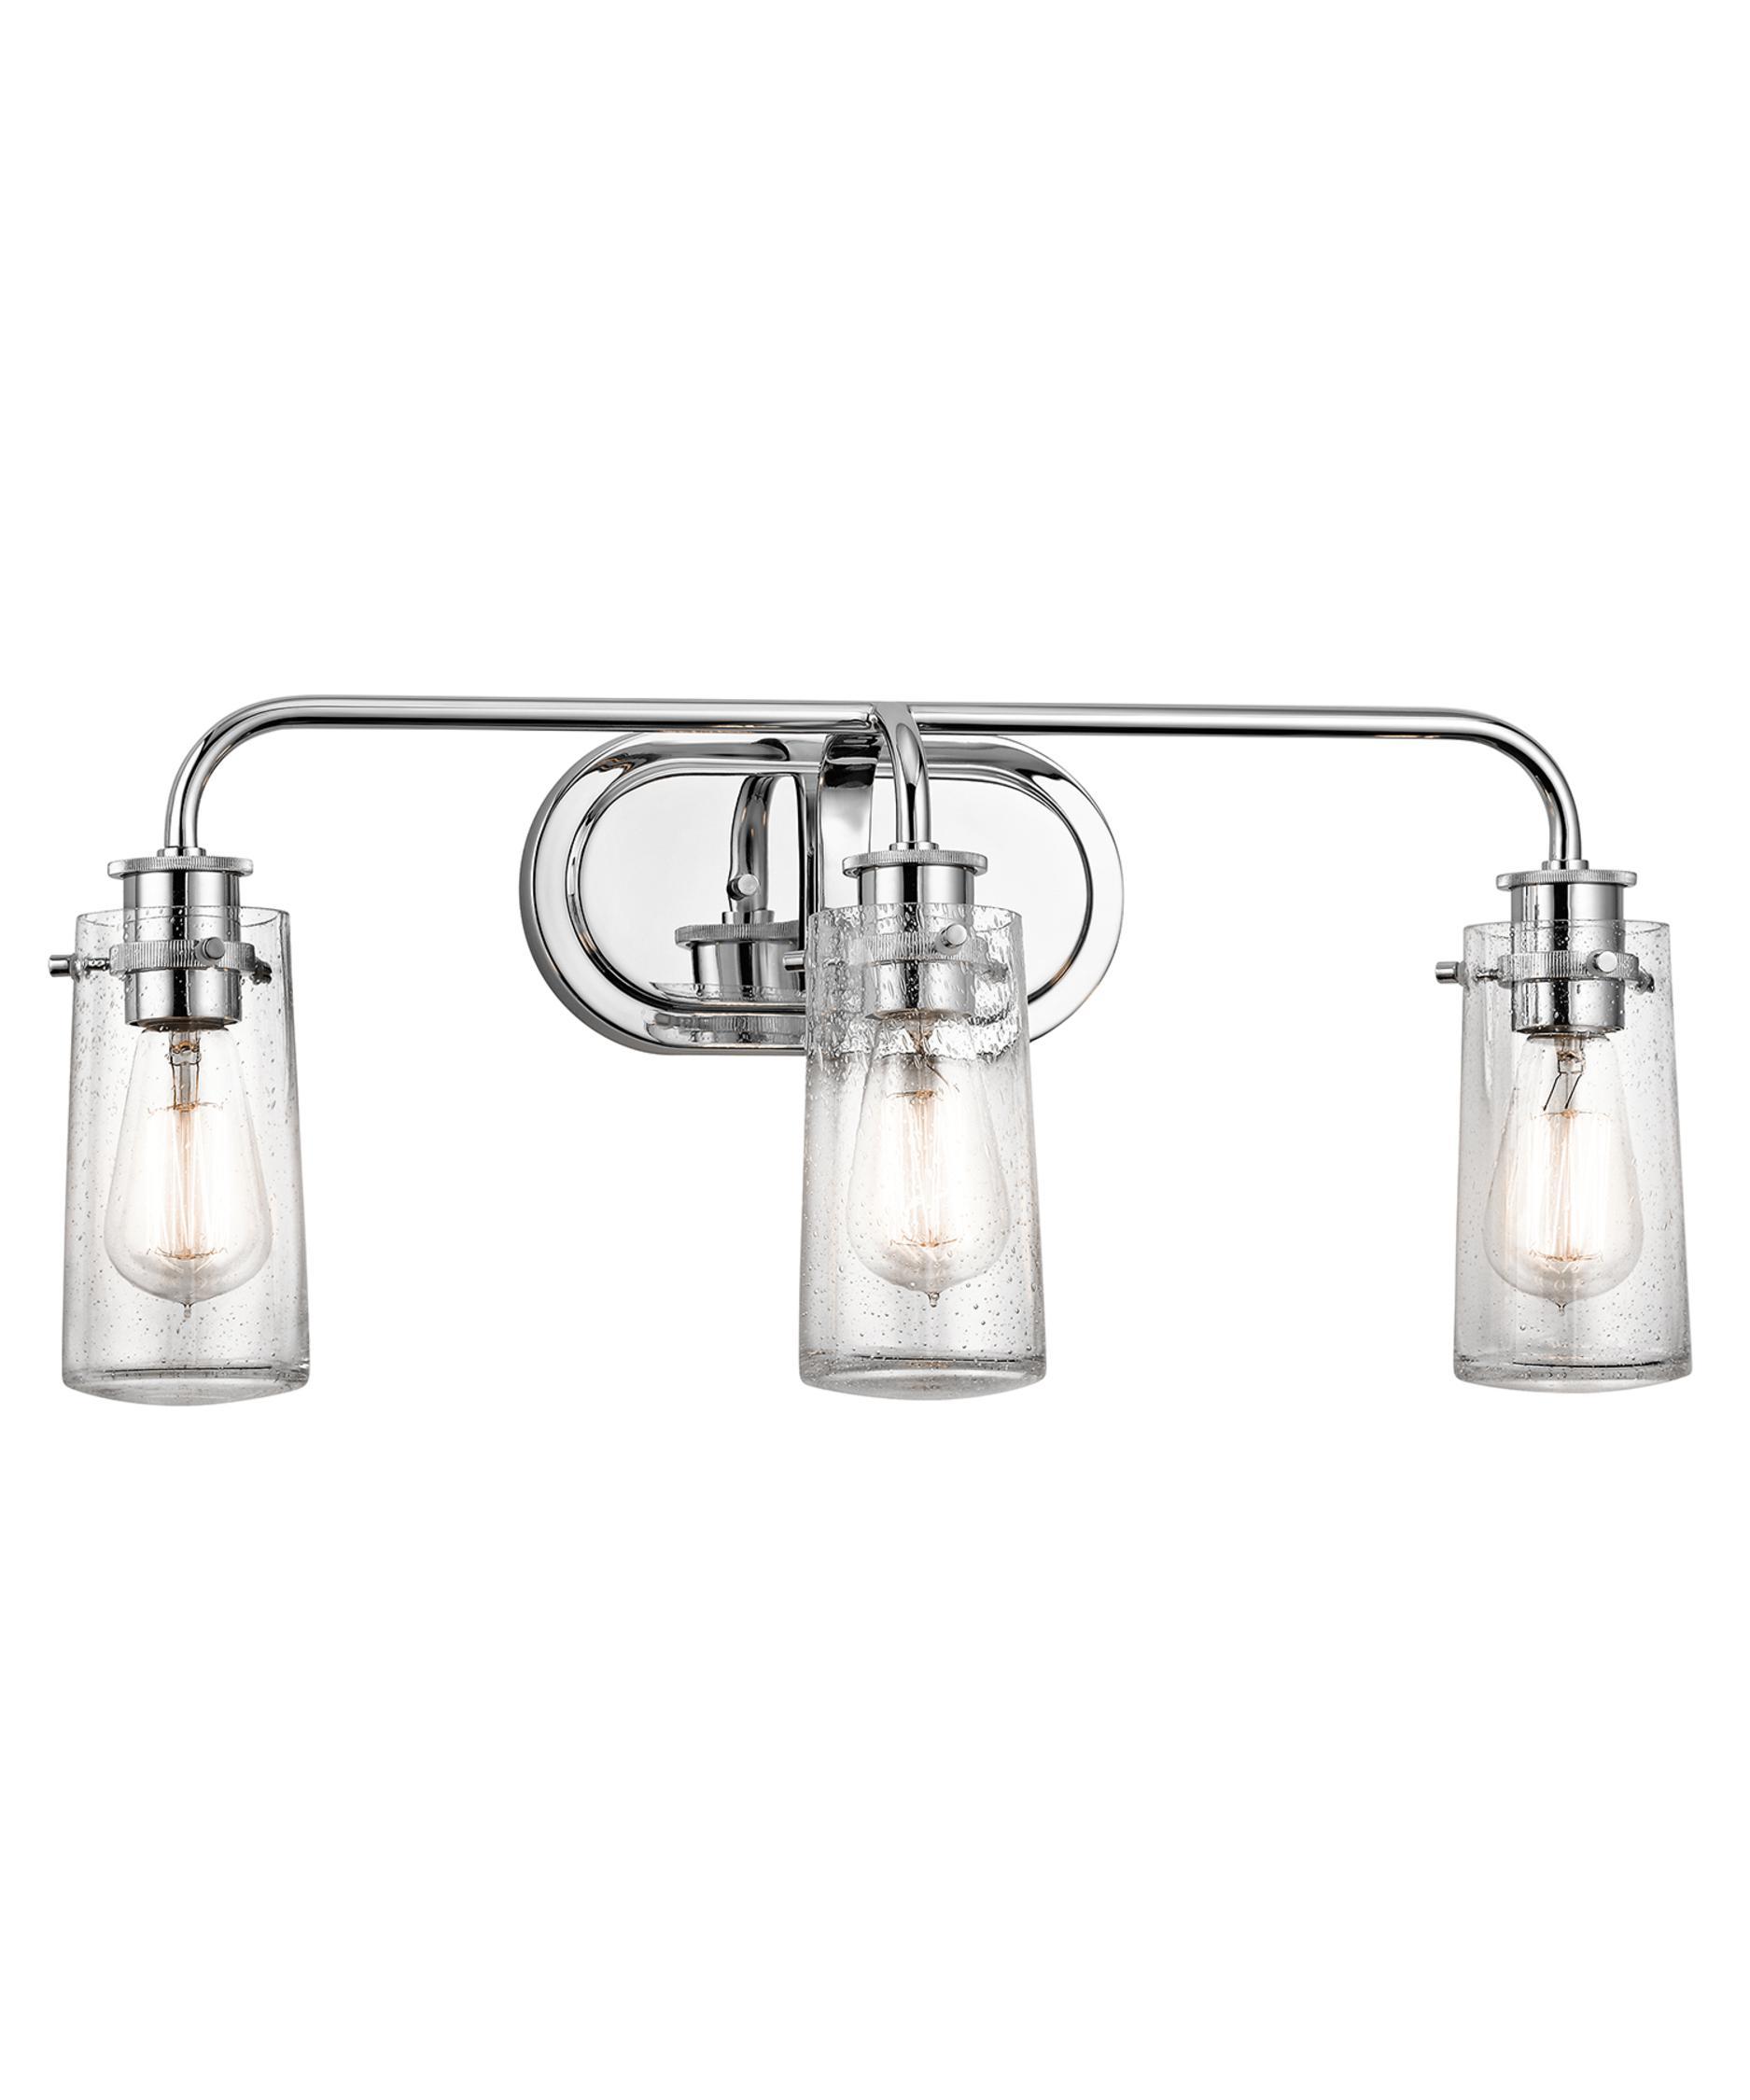 Bathroom Vanity Lights Clear Glass kichler 45459 braelyn 24 inch wide bath vanity light | capitol